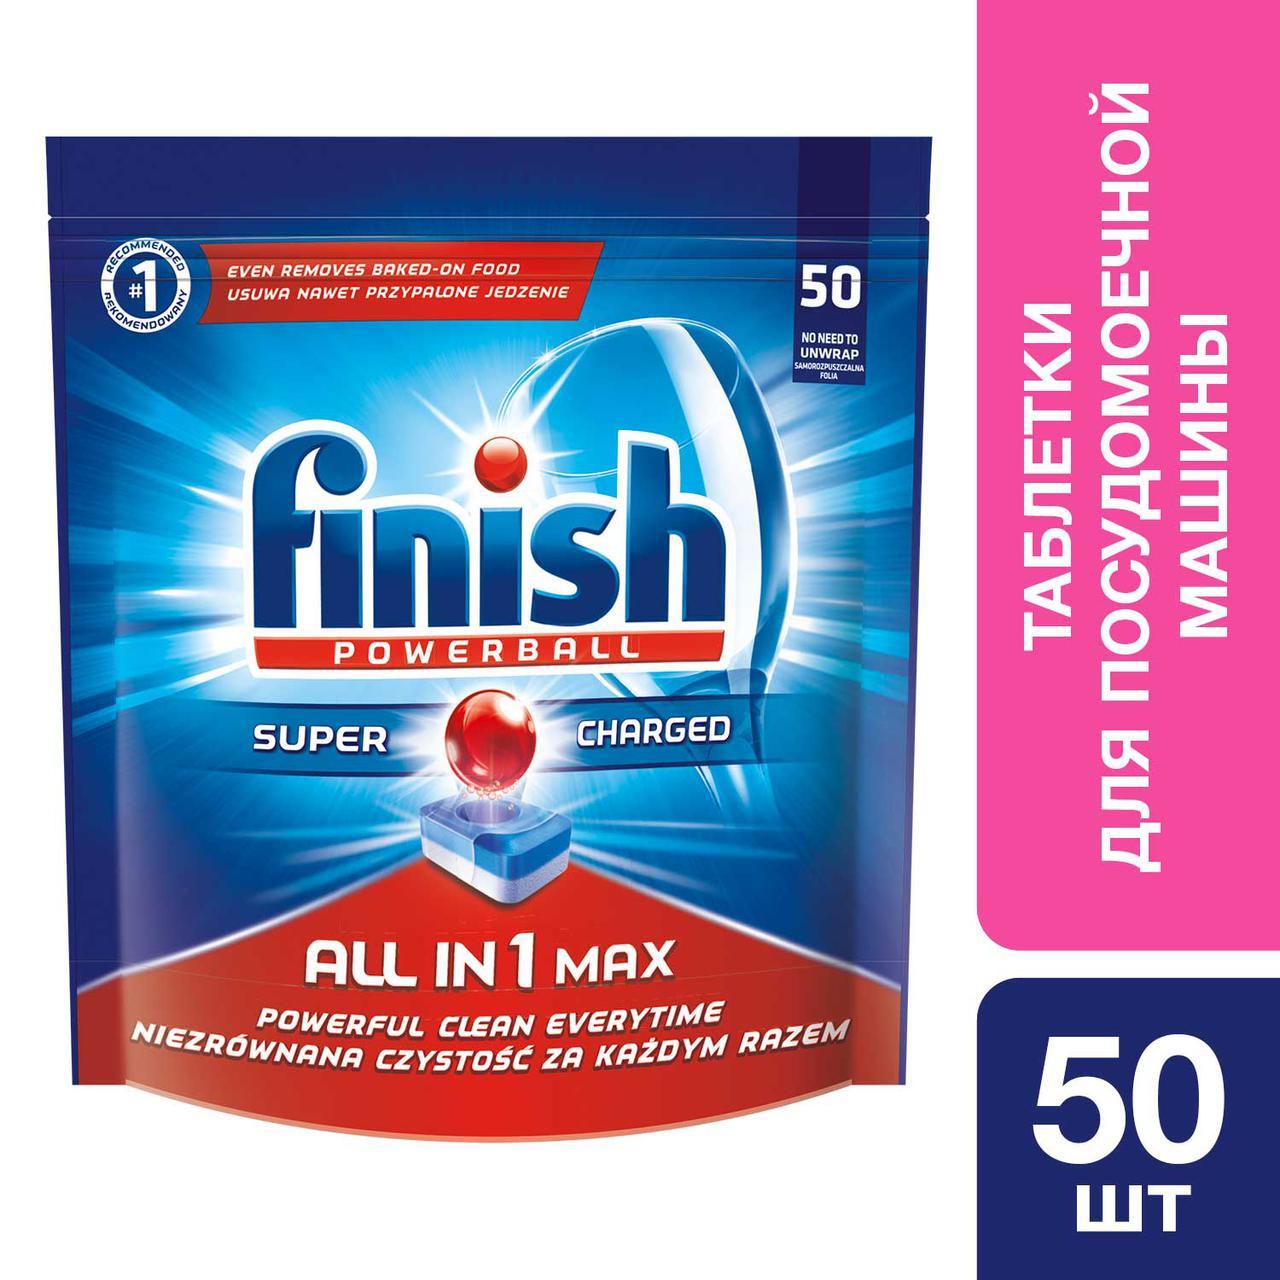 FINISH Powerball ALL IN 1 Max 50 tabs Средство для мытья посуды в посудомоечных машинах в таблетках 50 шт